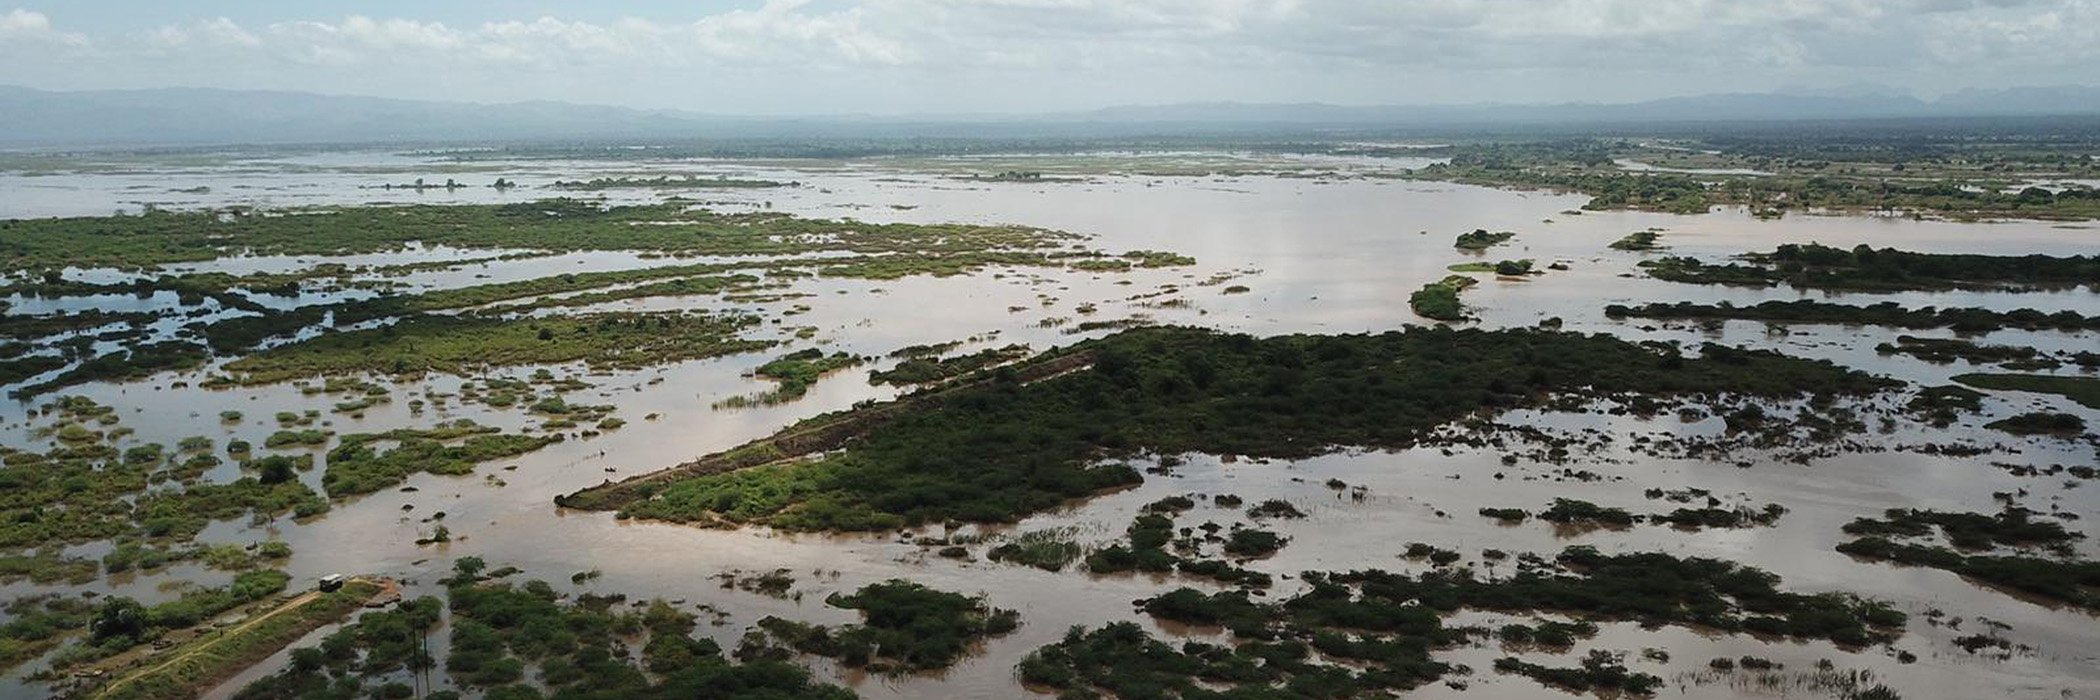 Cyclone-Idai-Africa-Mozambique.jpg